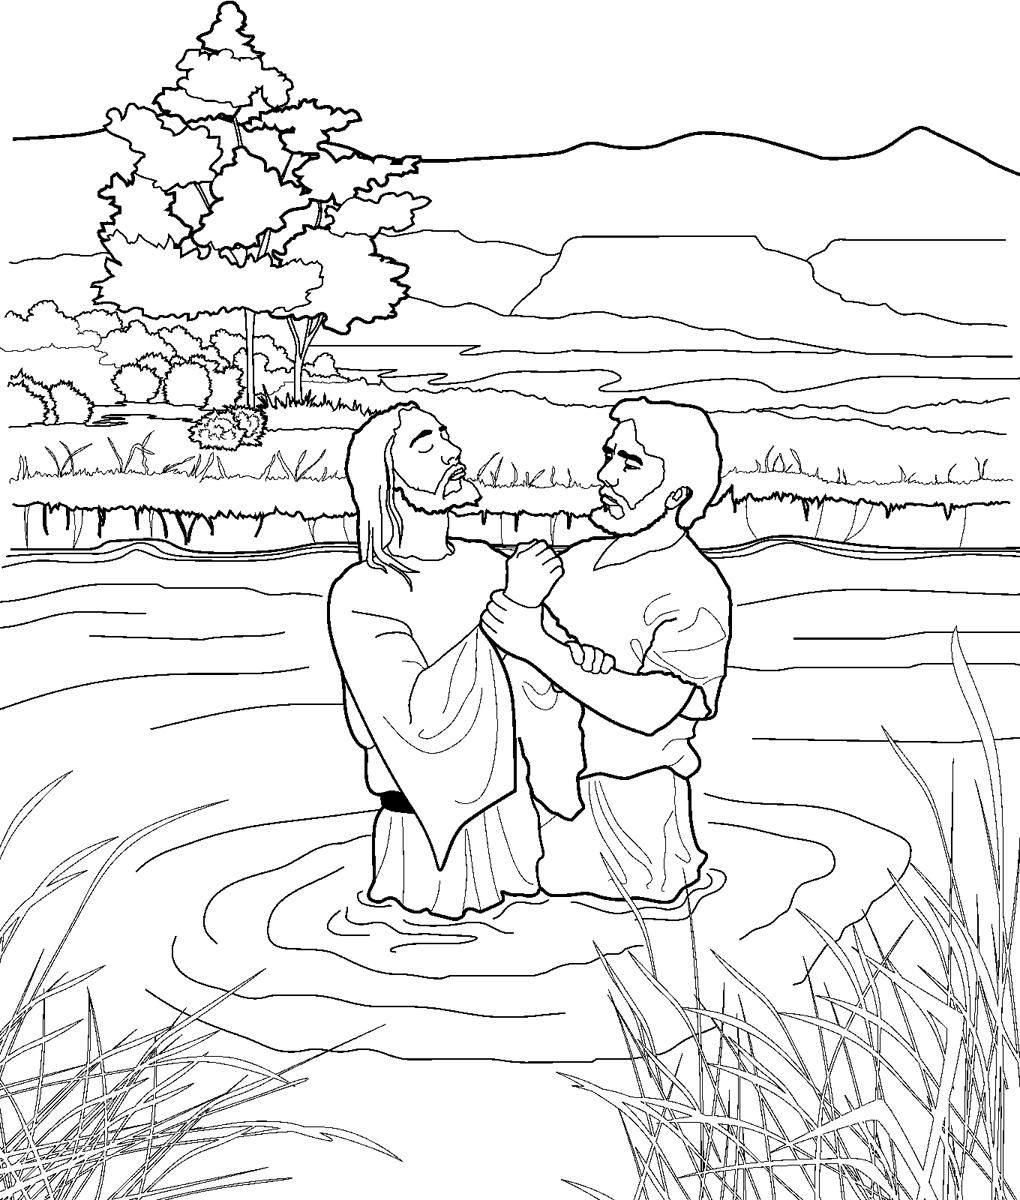 coloring pages line art - photo#46